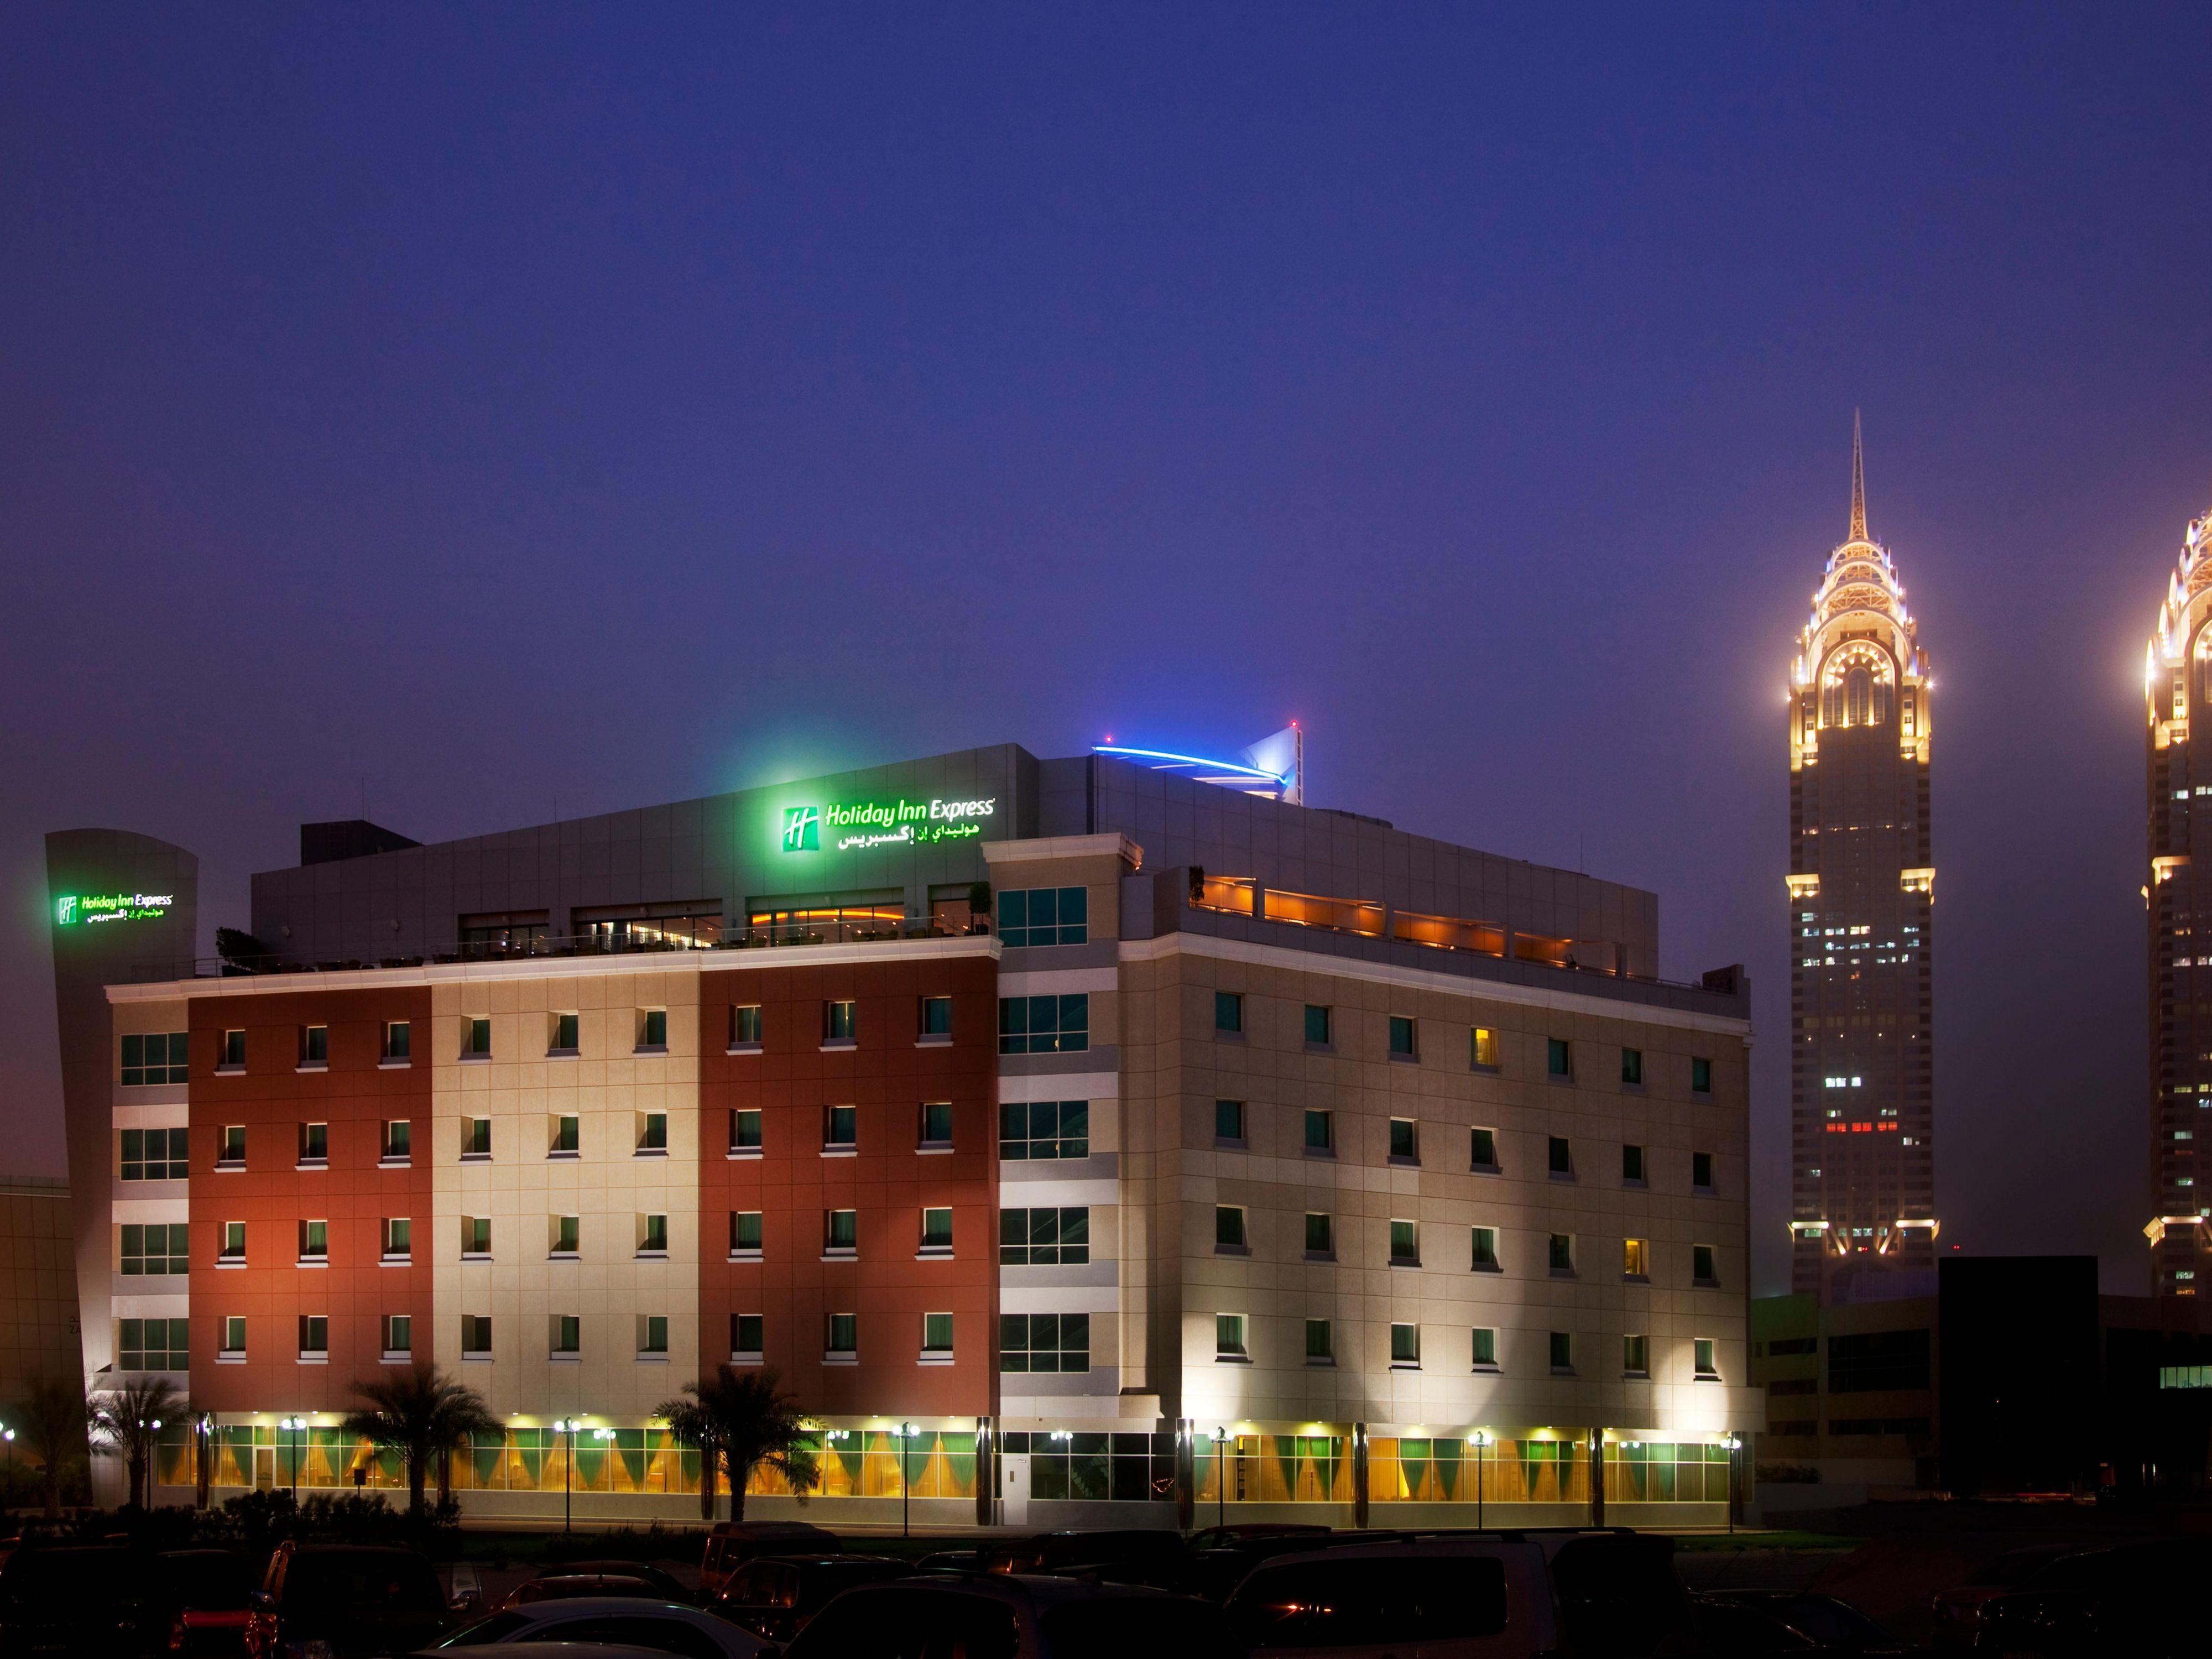 Holiday inn express dubai internet city hotel by ihg reheart Gallery